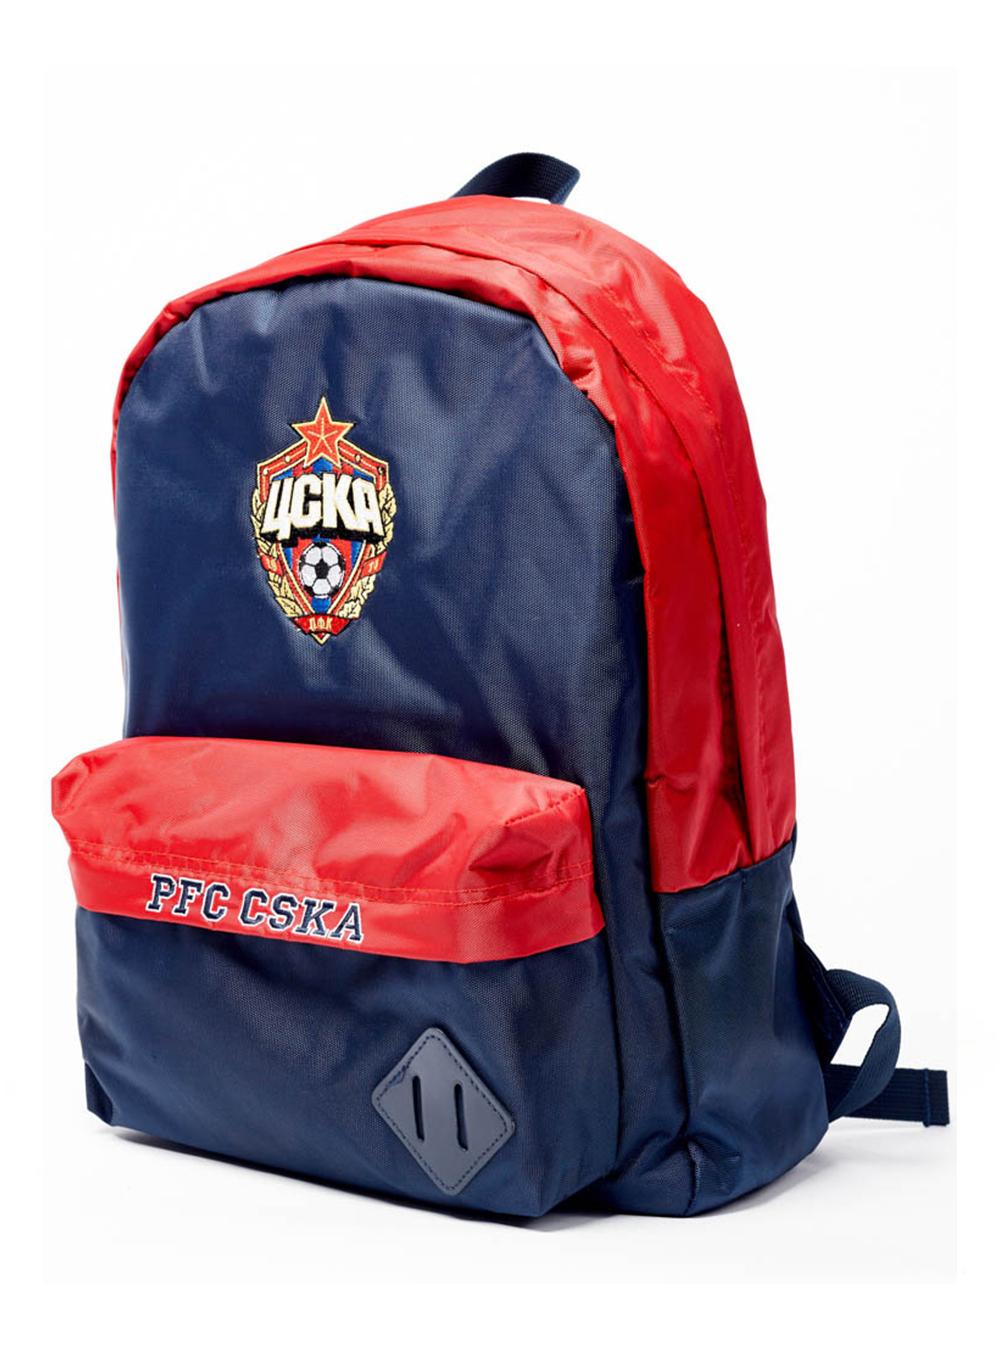 Рюкзаки цска рюкзаки для школы интернет магазин москва